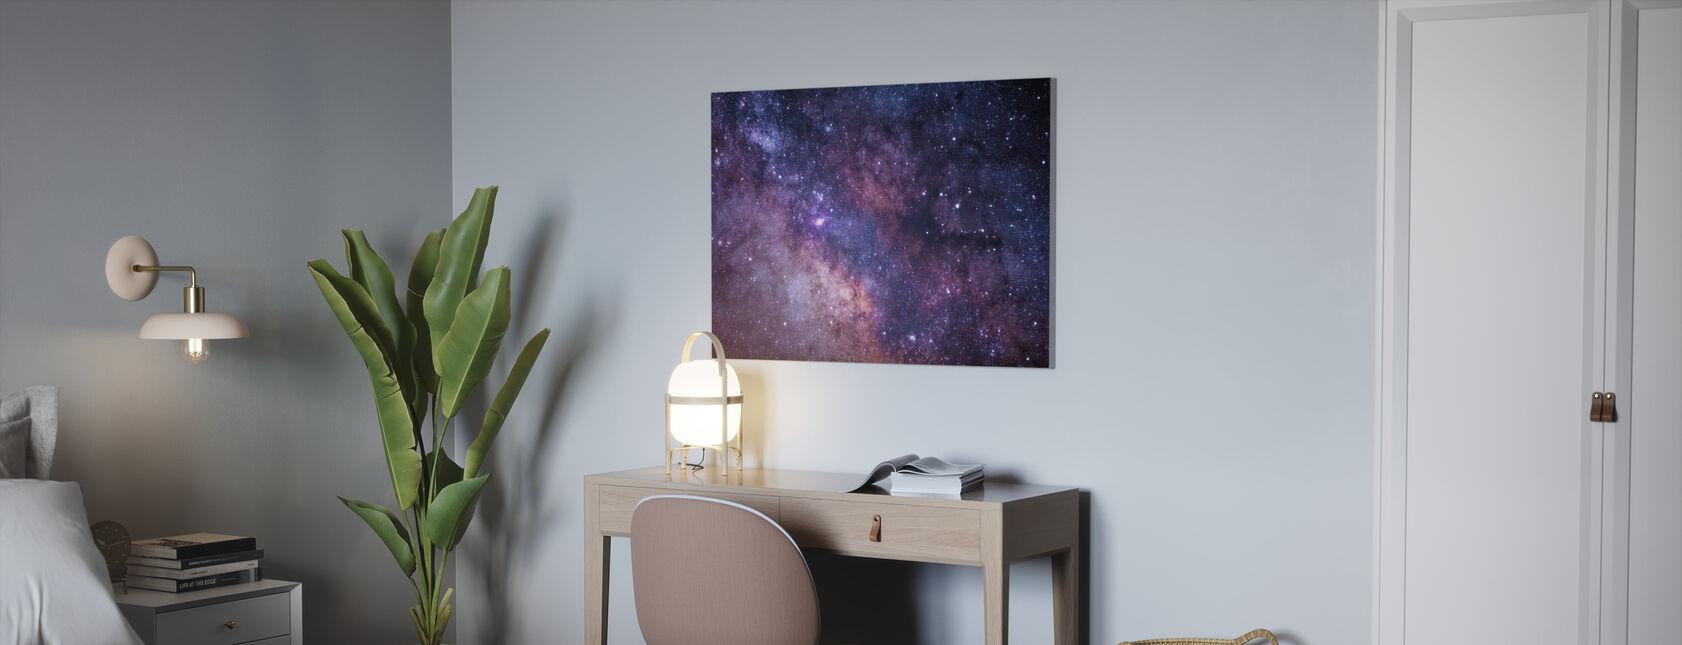 Melkweg - Canvas print - Kantoor